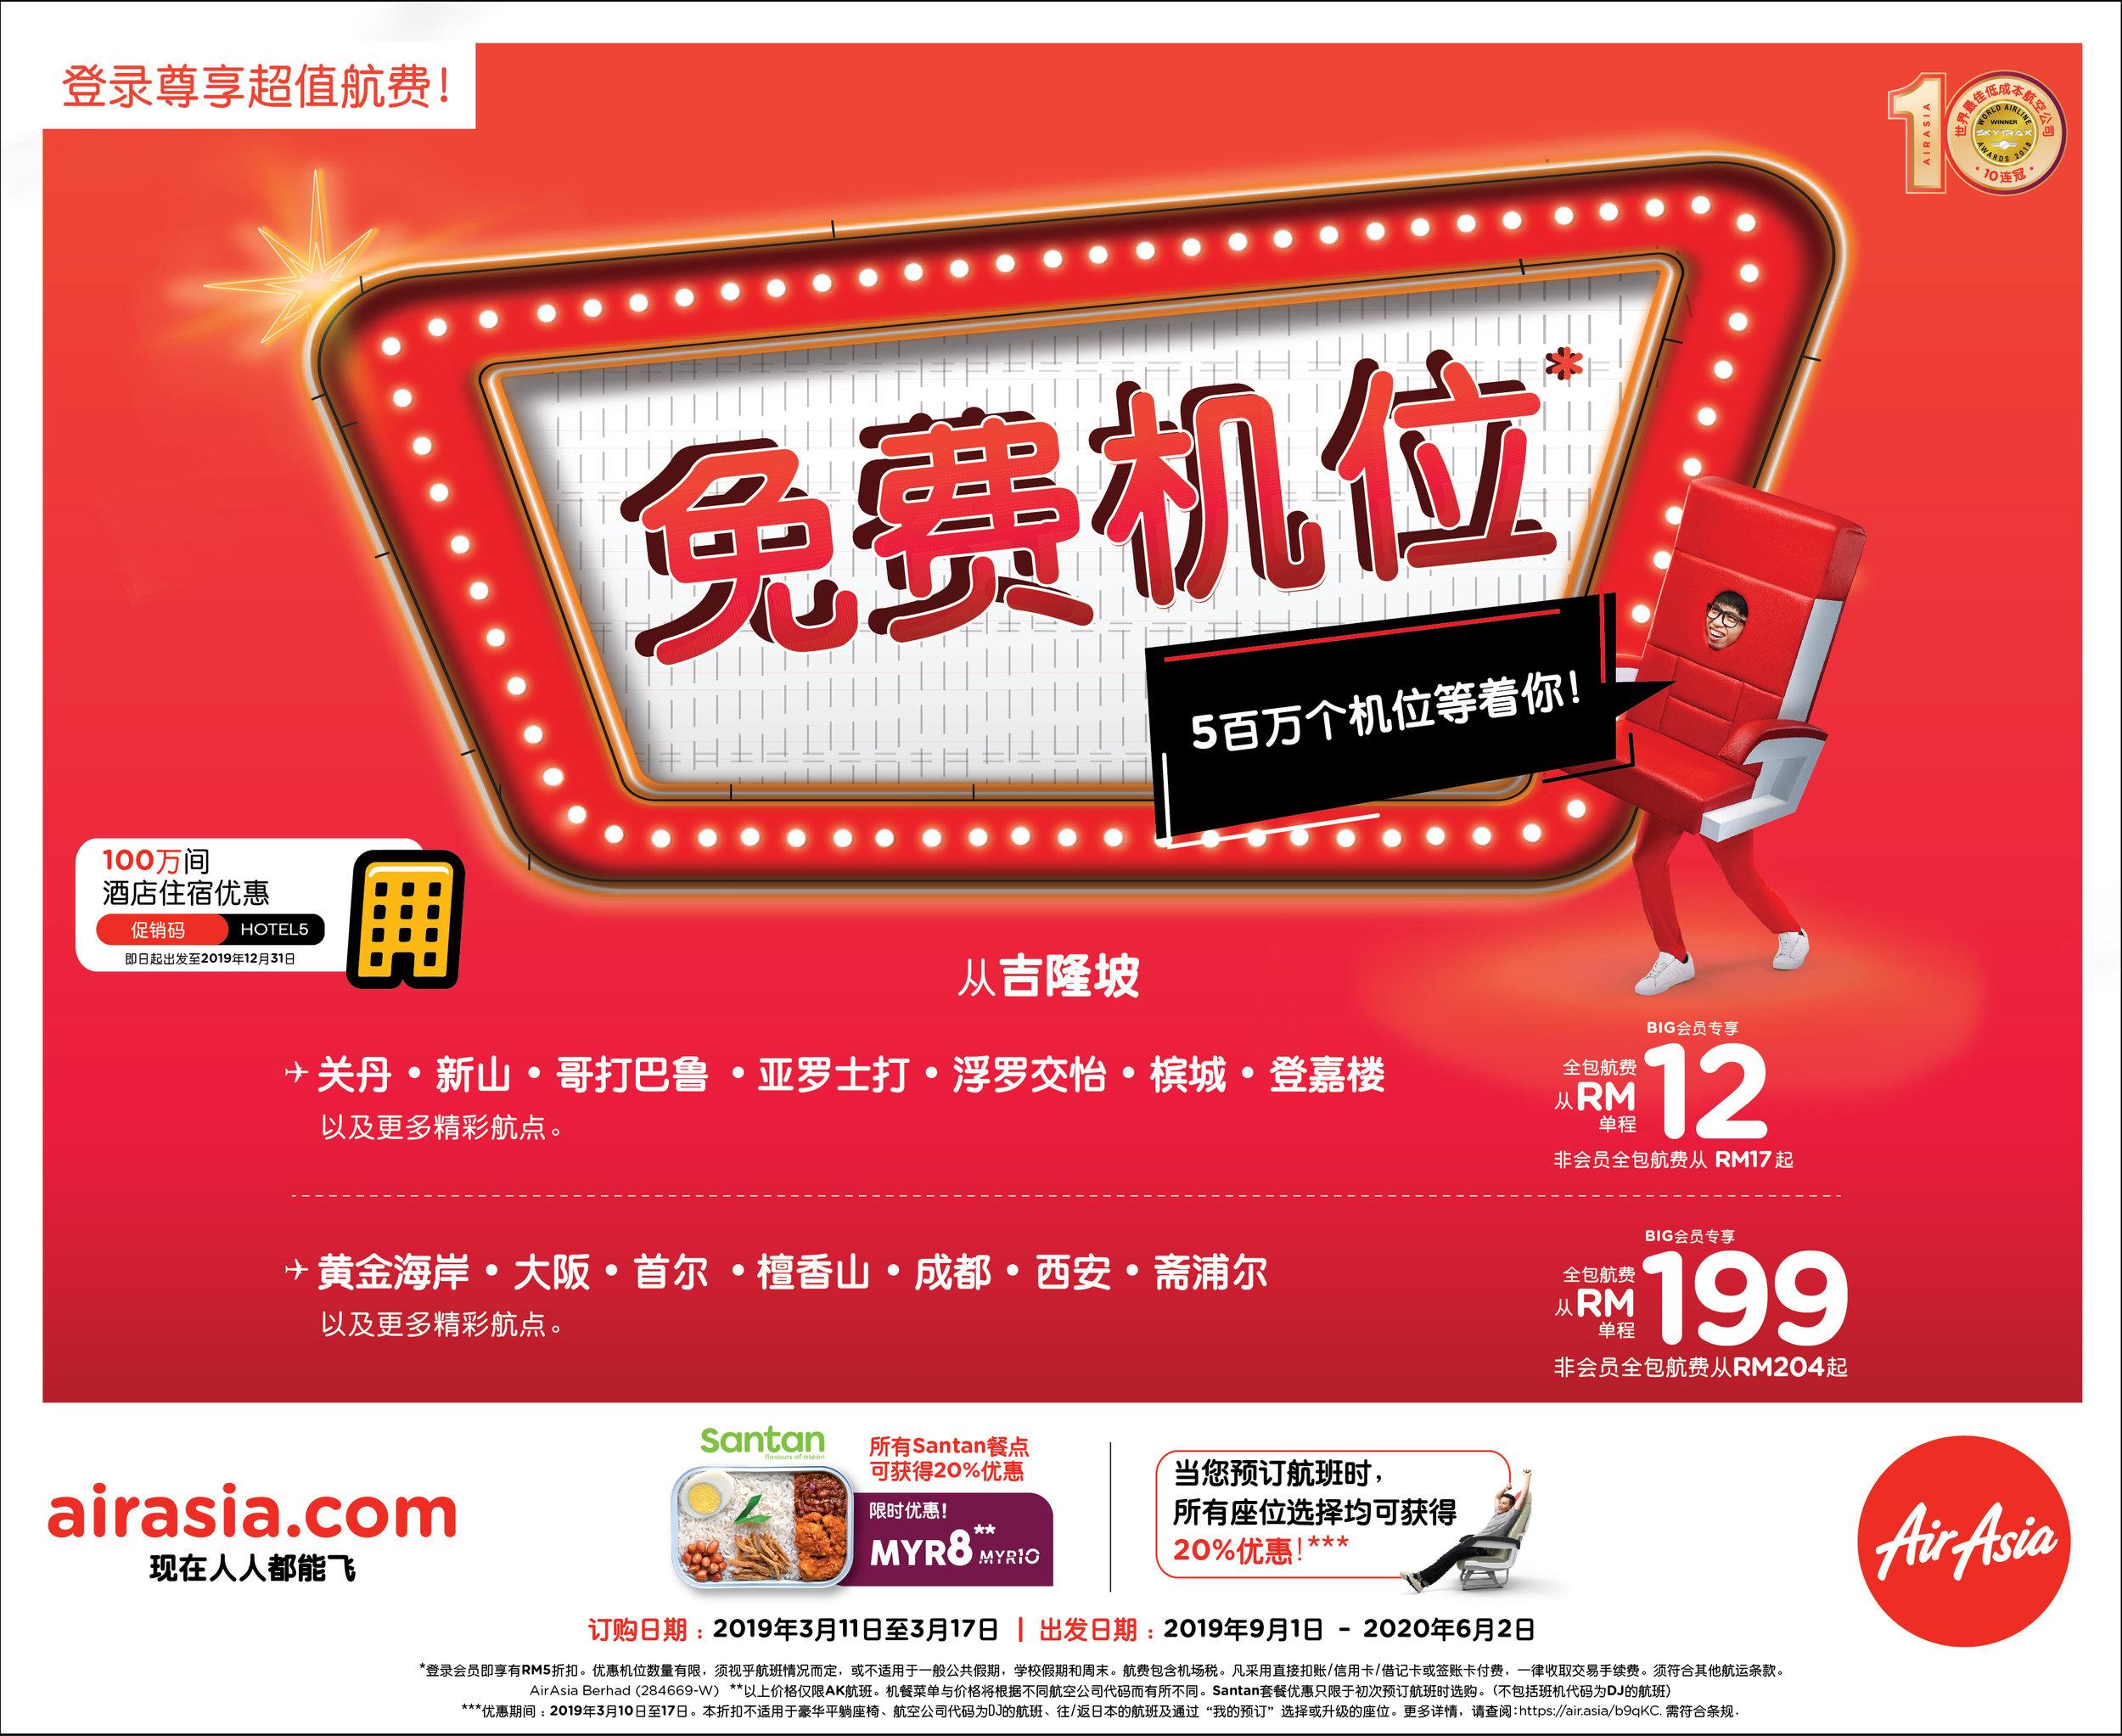 AirAsia Free Seats - CN.jpg